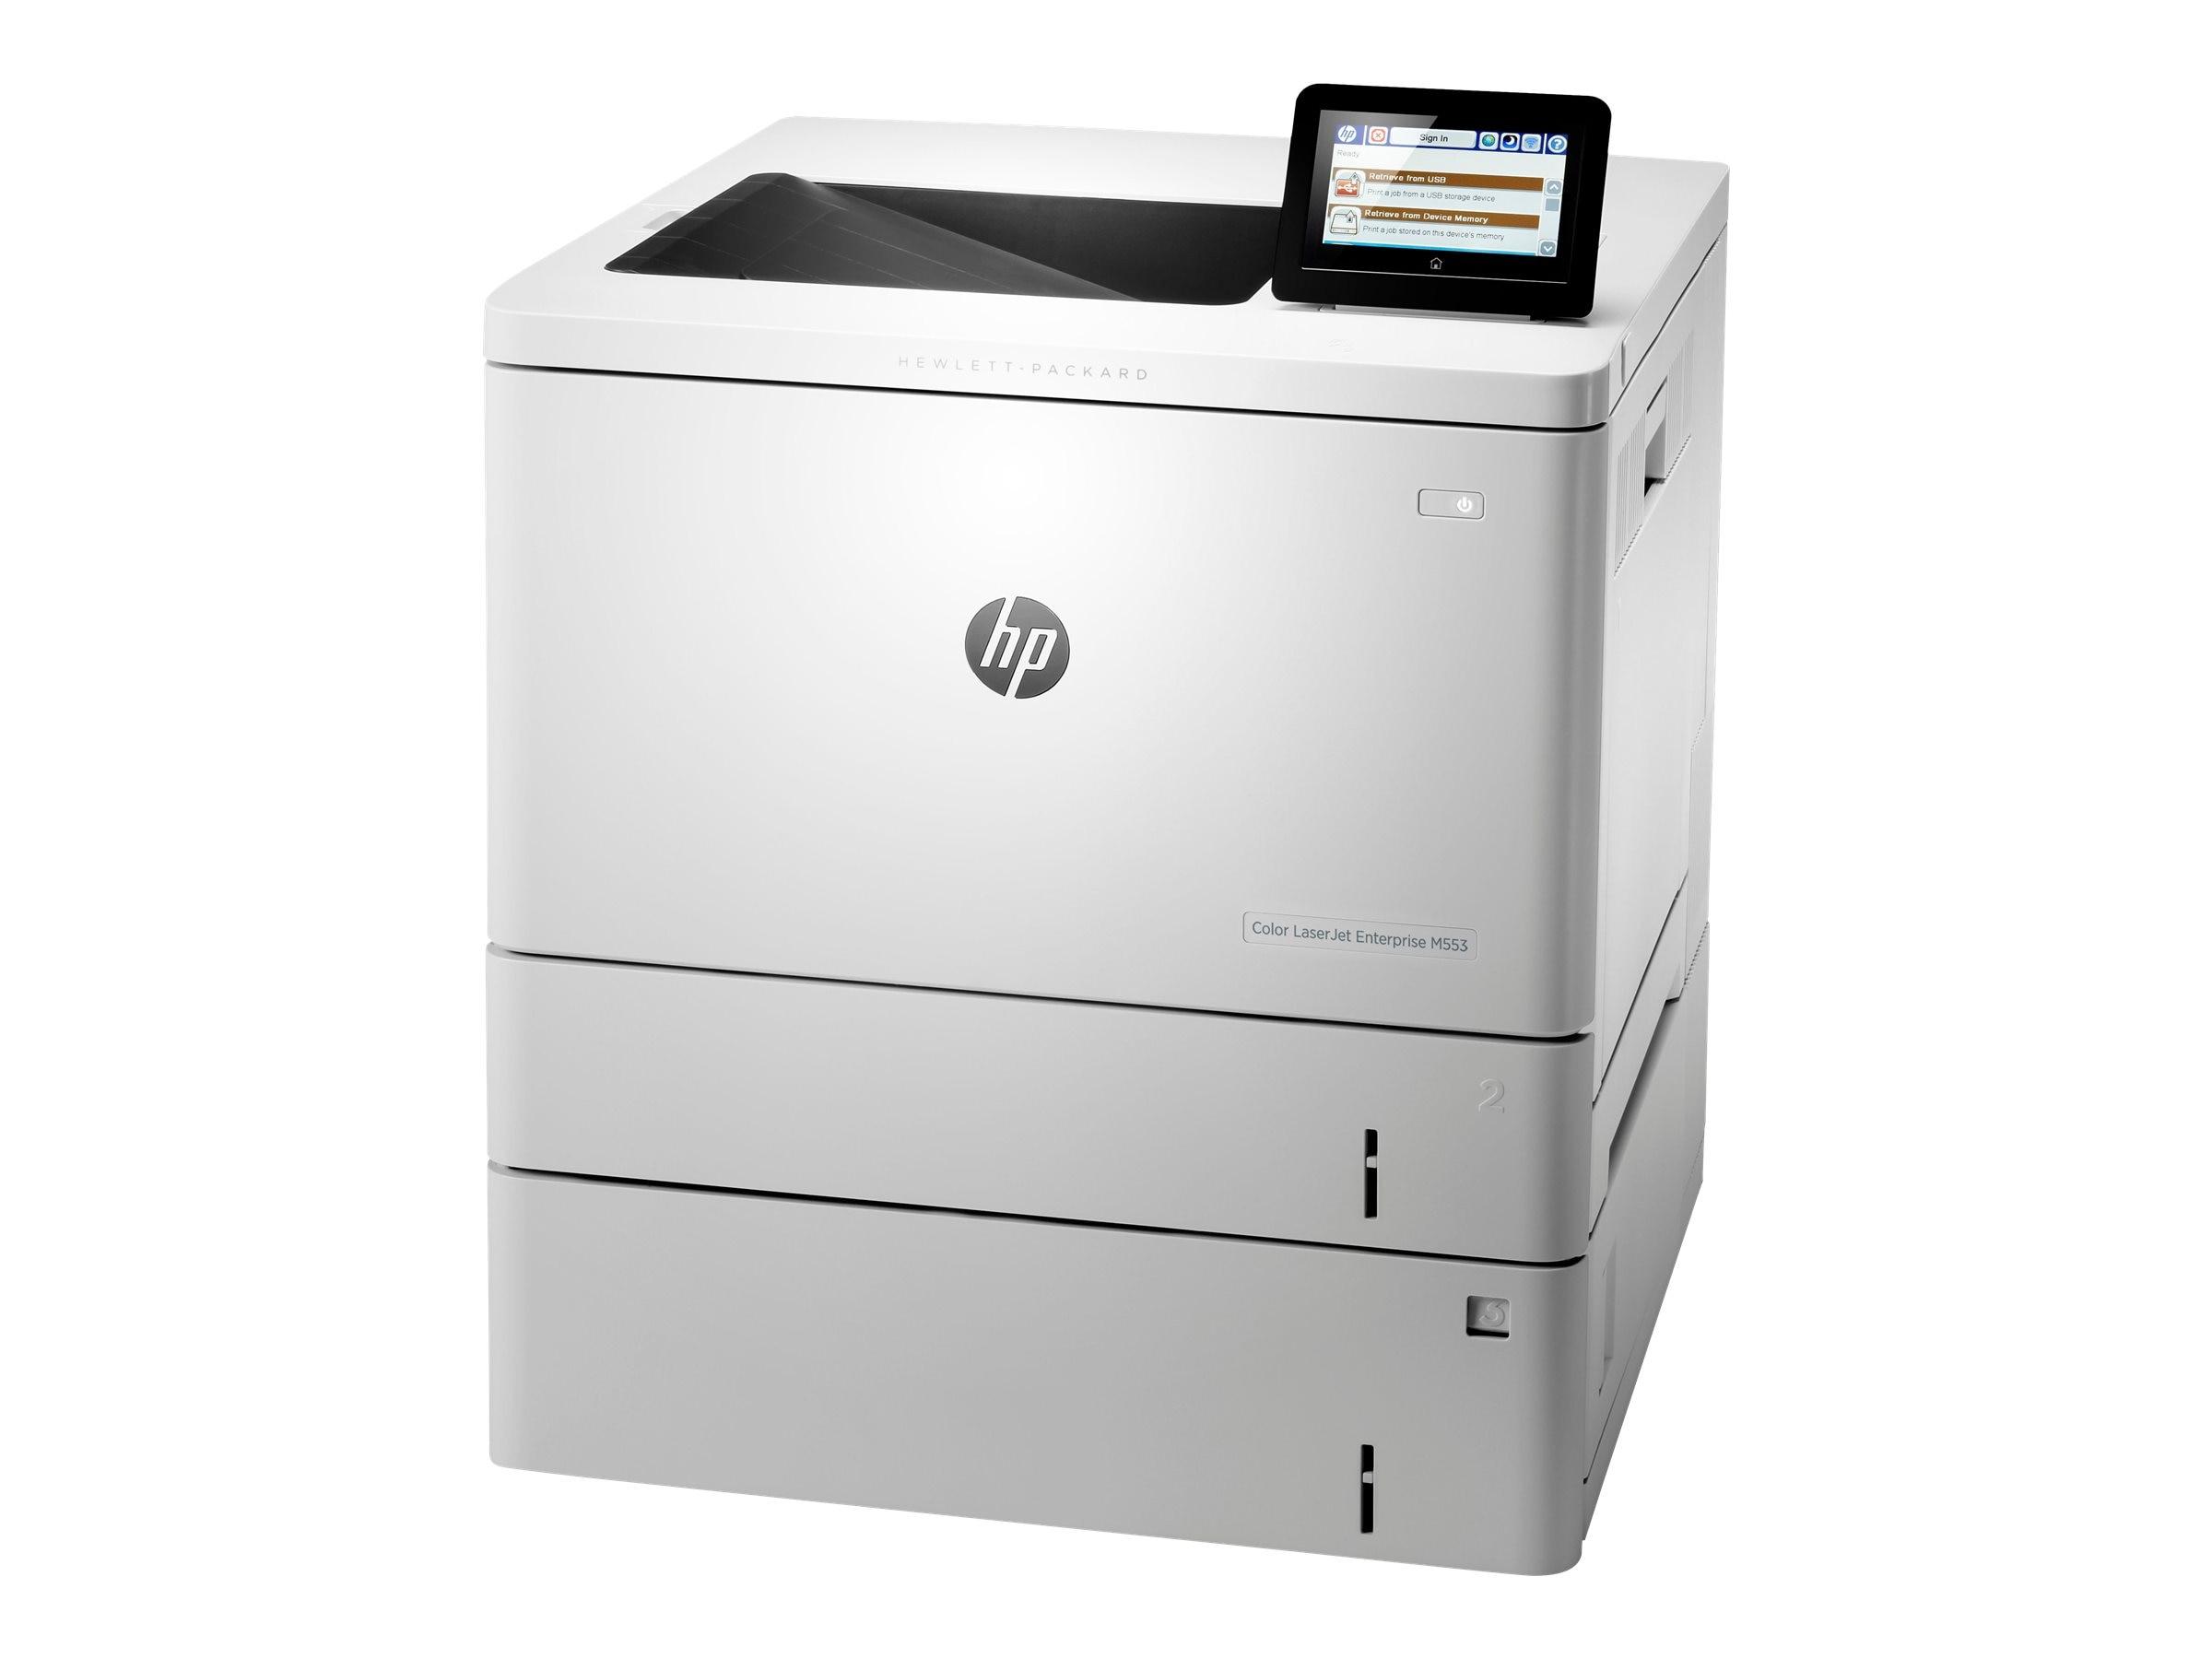 HP Color LaserJet Enterprise M553x Printer ($1,199.00-$240 Istant rebate=$959.00. expires 12 31), B5L26A#BGJ, 18983033, Printers - Laser & LED (color)